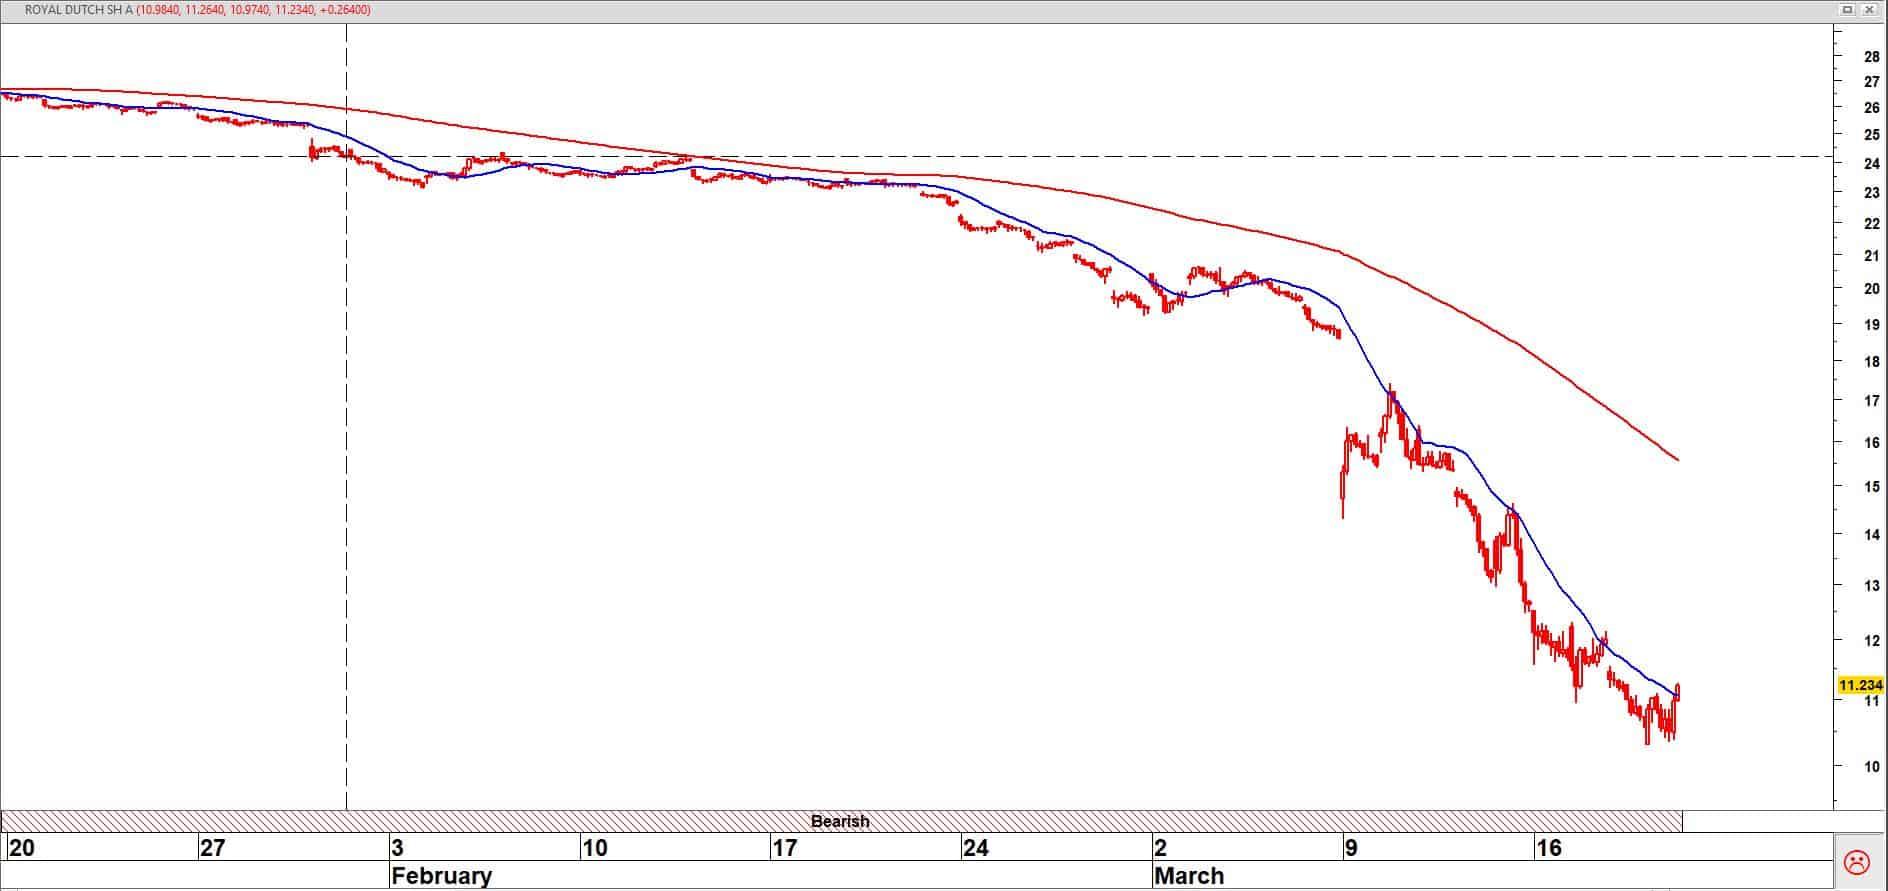 Royal Dutch Shell op uurbasis + 20/120-uurs gemiddelden